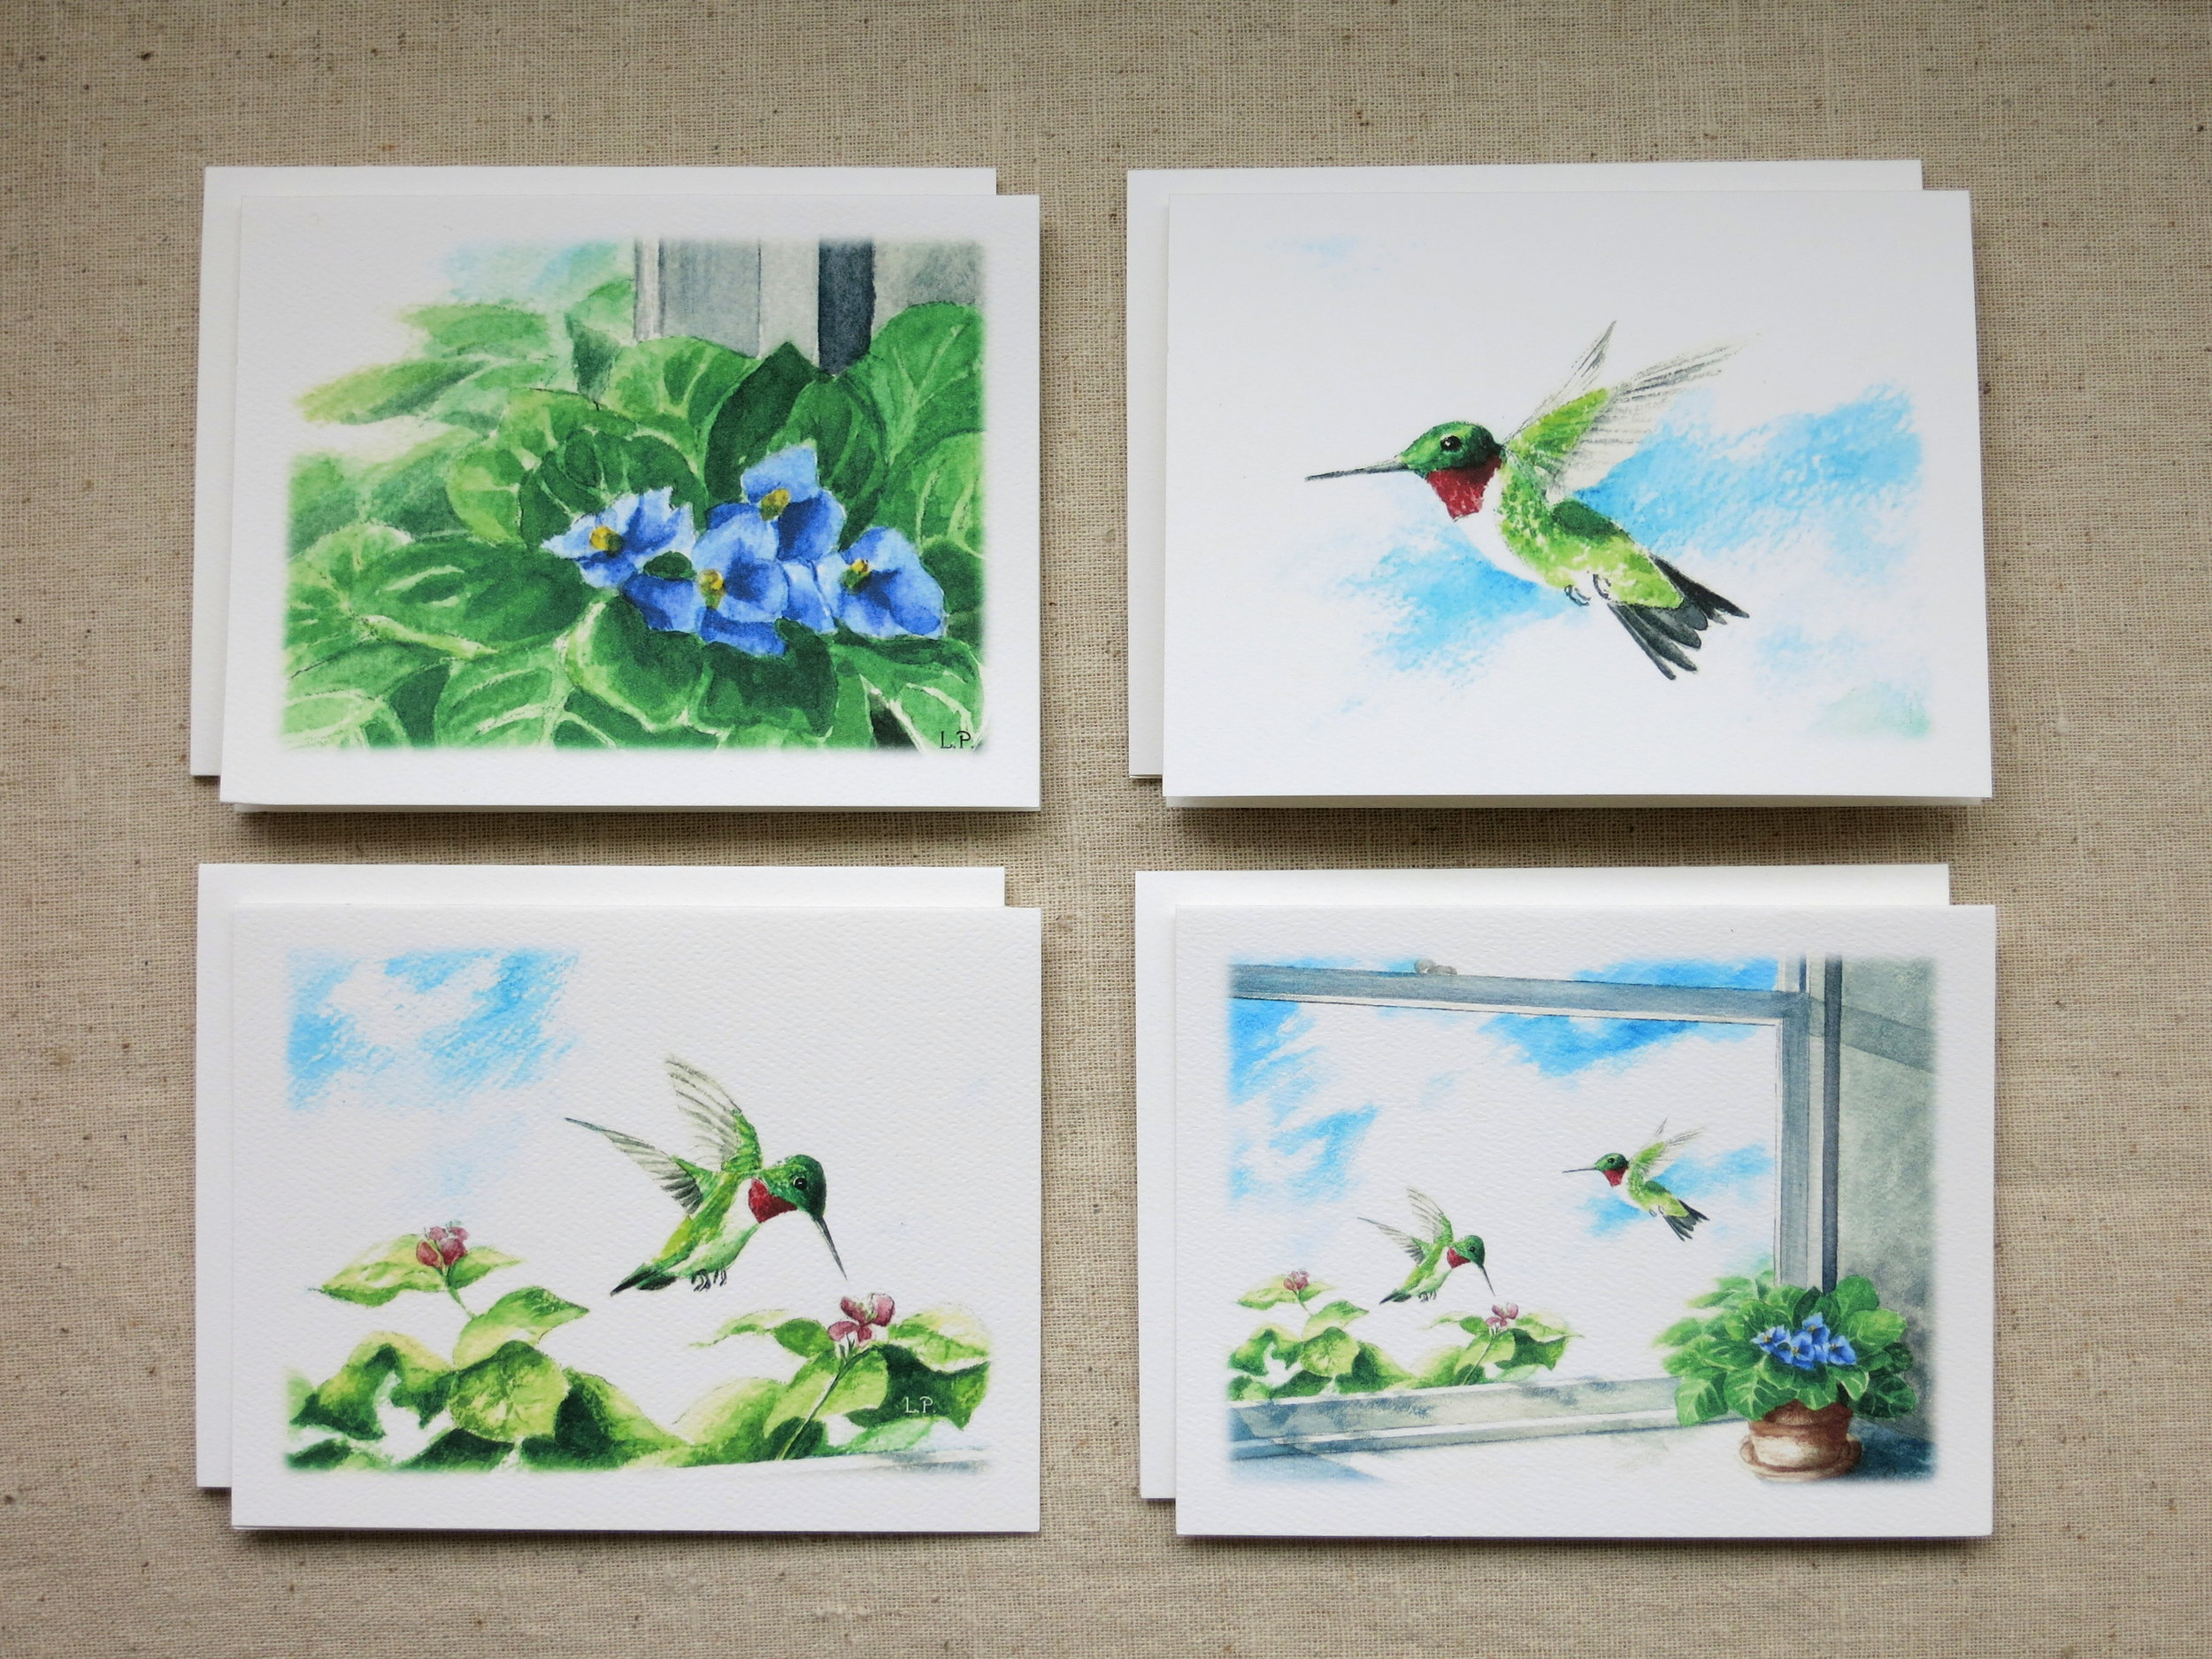 HUMMINGBIRD NOTE CARDS - 2 each of 4 designs - Blank inside